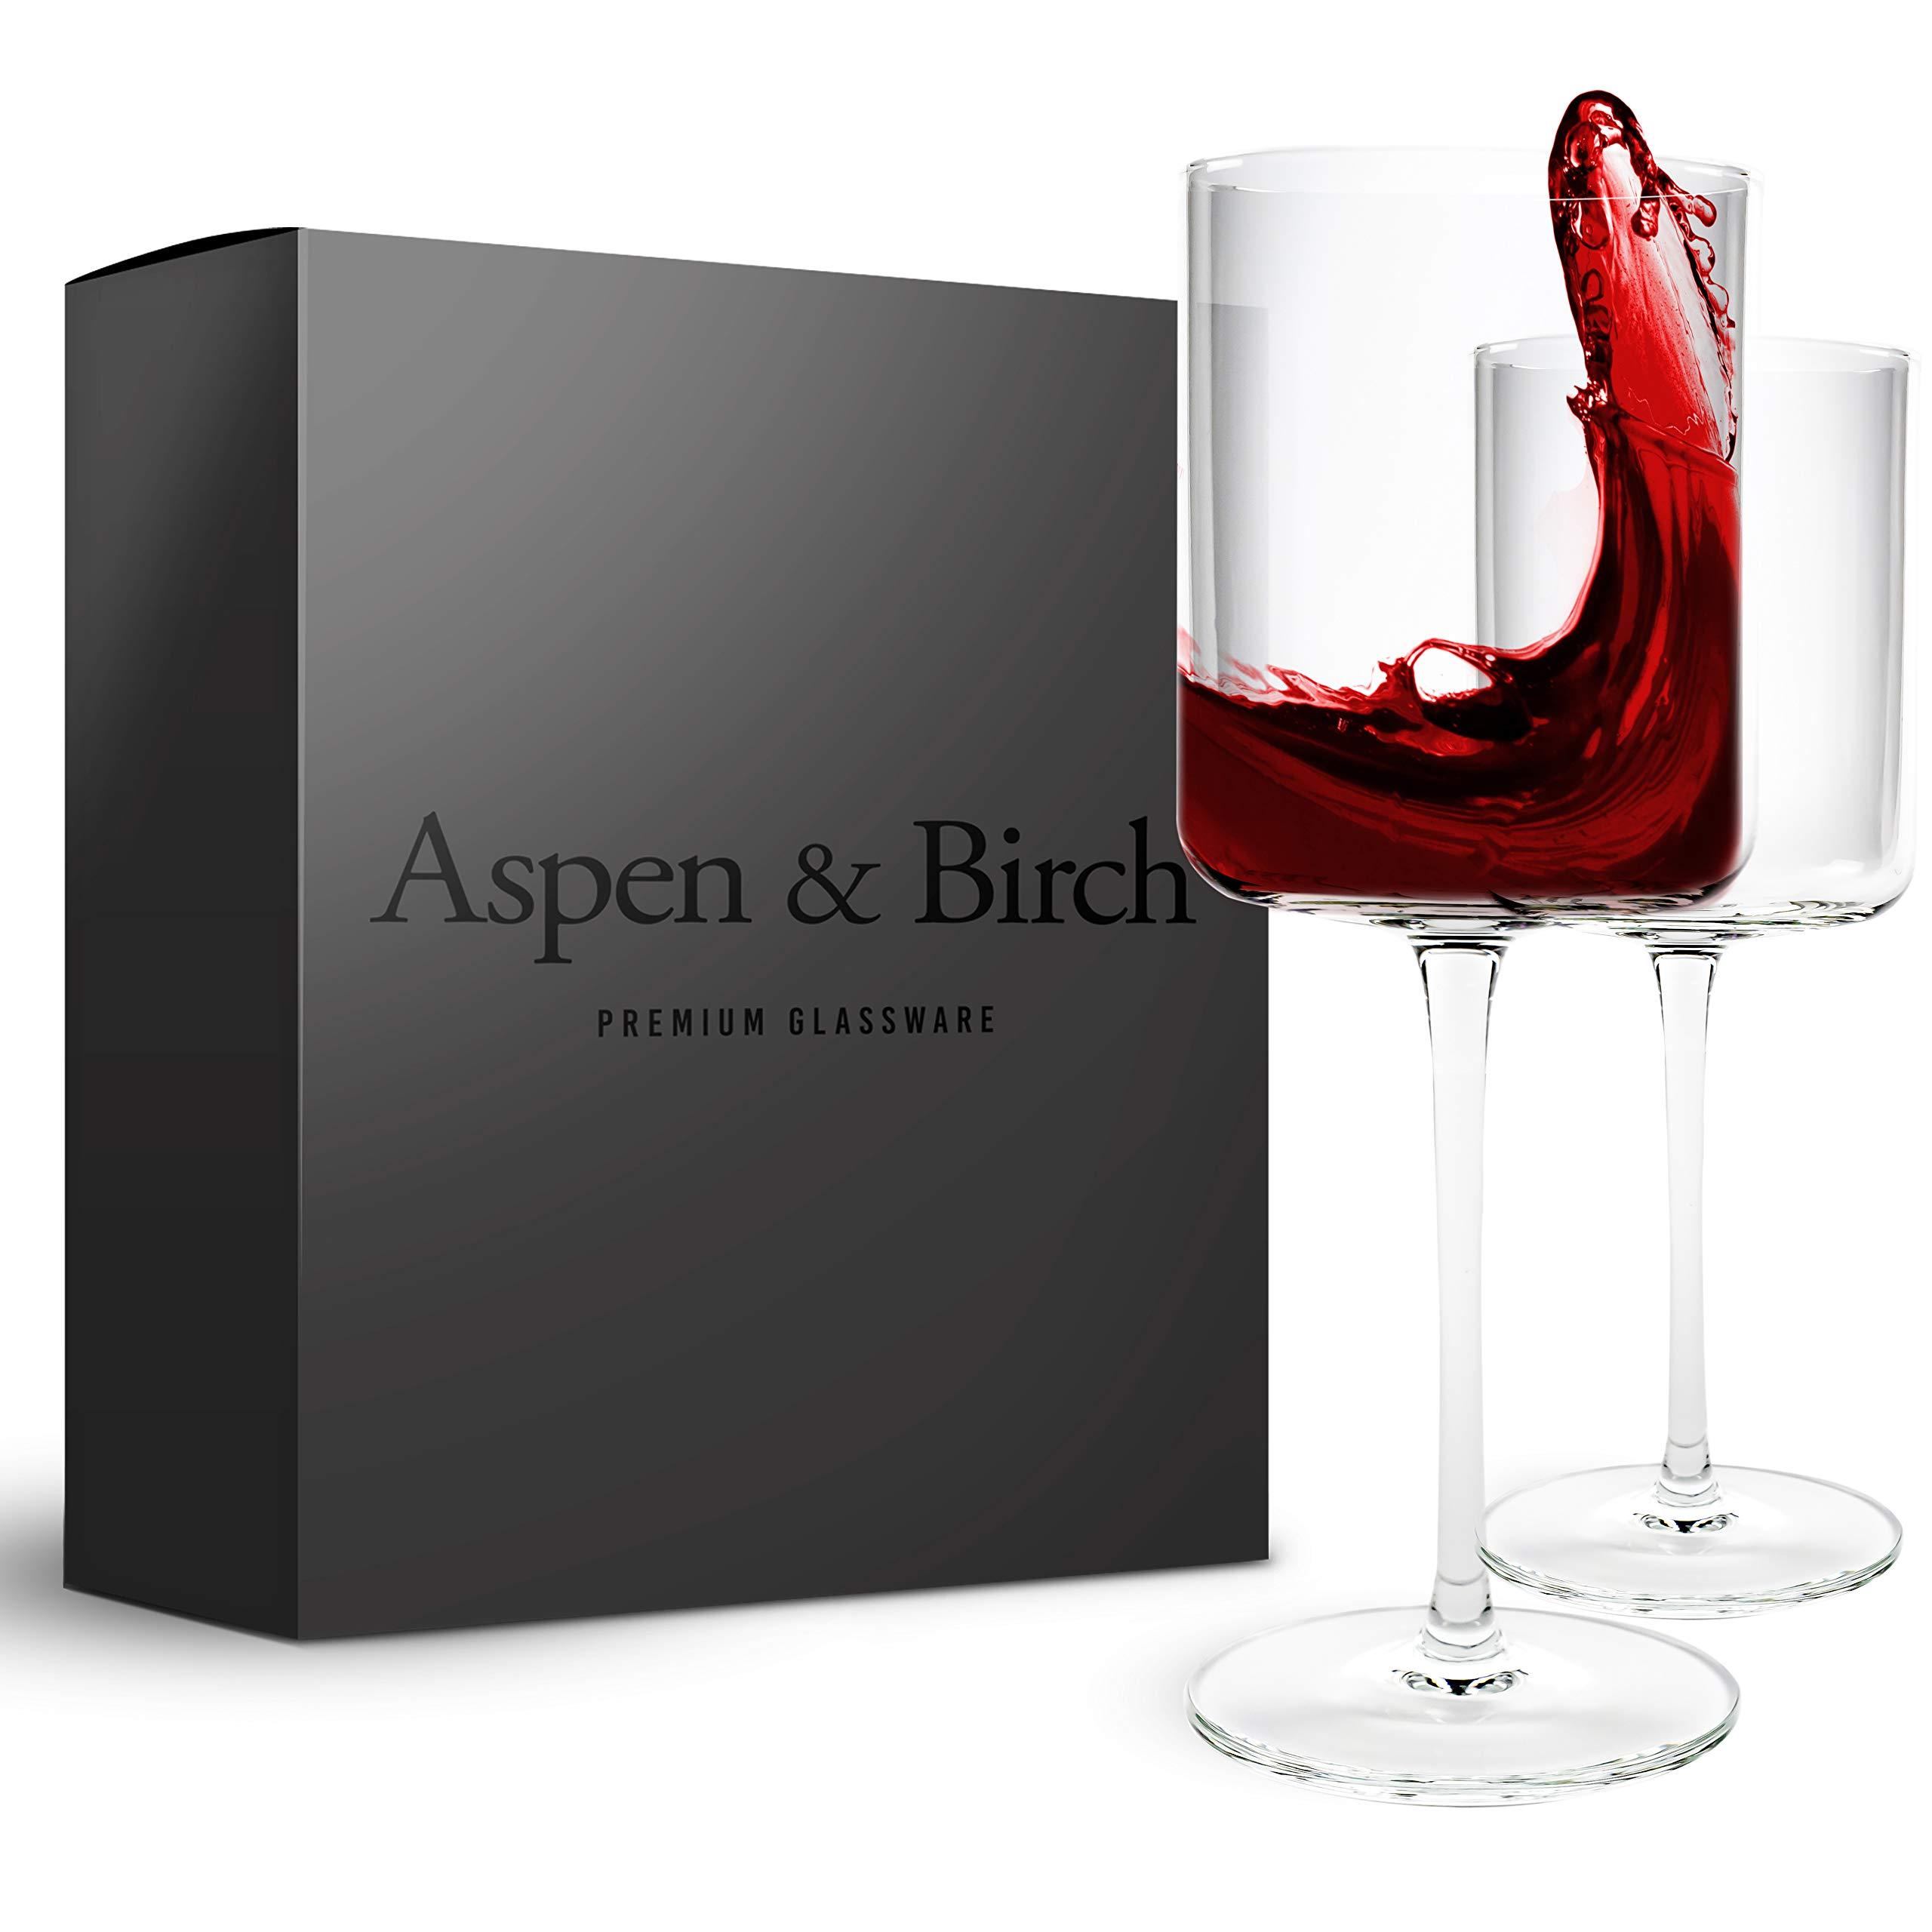 Aspen & Birch | Modern Wine Glasses Set of 6 | Red Wine Glasses or White Wine Glasses | 100% Lead Free Crystal Stemware | Large Long Stem Wine Glasses Set | Clear | 15oz | Hand Blown Glass